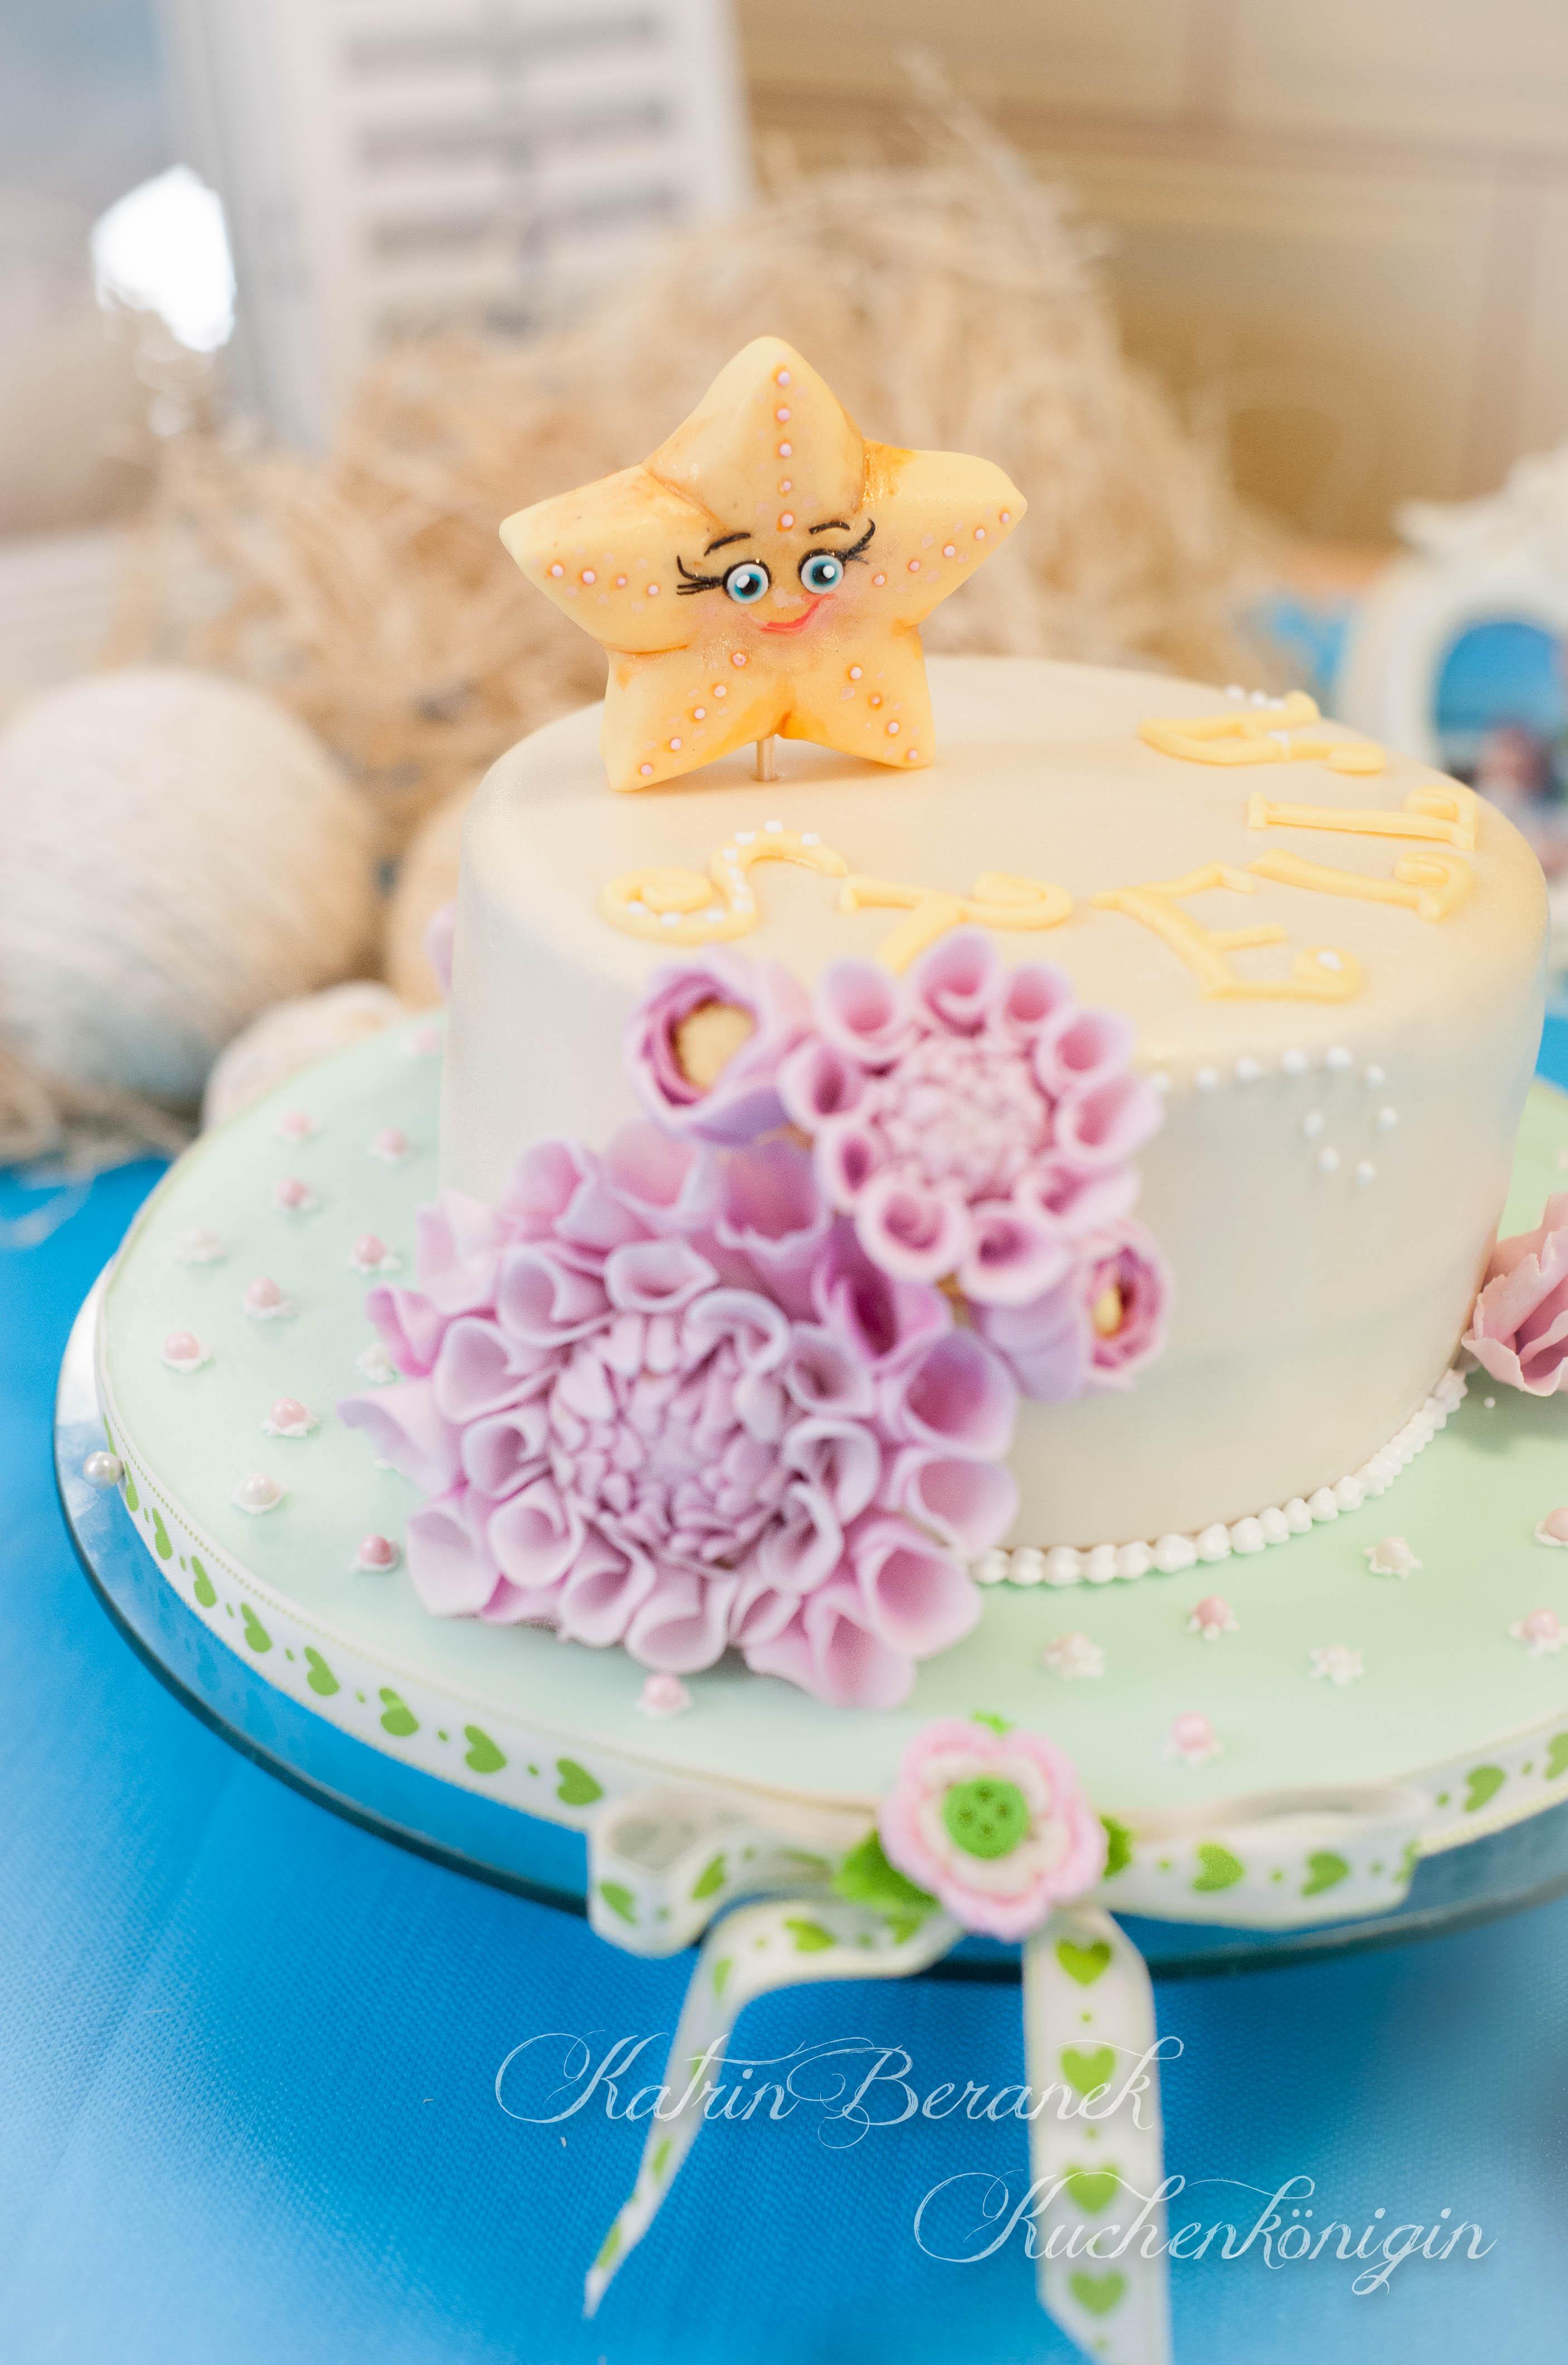 Dahlien Kuchenkönigin Zuckerblüten Tutorial Fondant Blütenpaste Baby Taufe Stern Kuchen